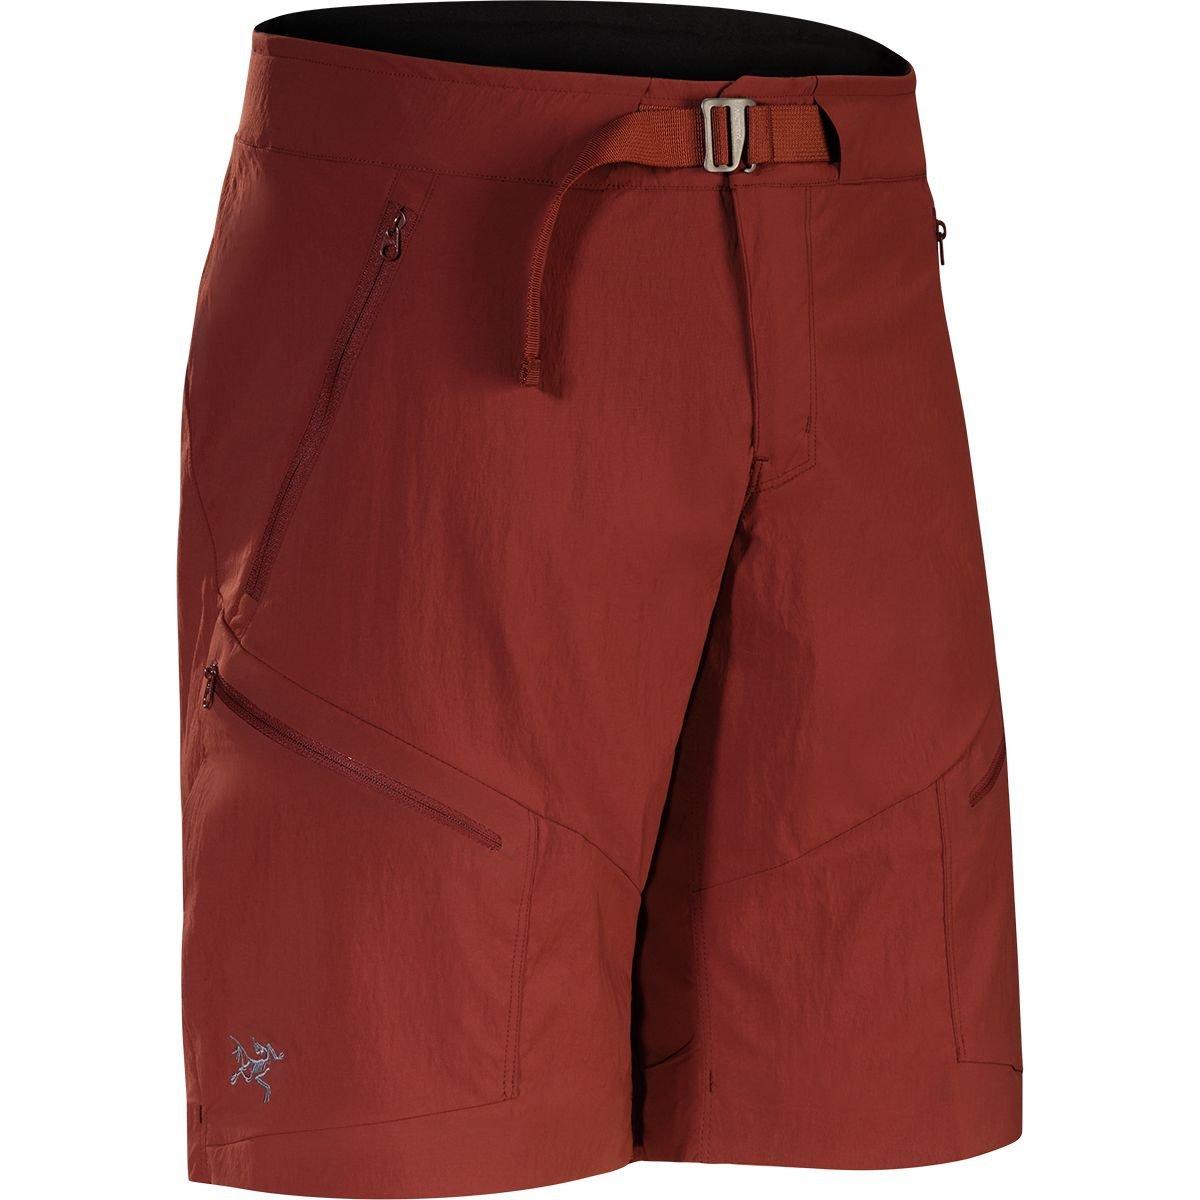 ARC'TERYX(アークテリクス) Palisade Short Men's パリセード ショート メンズ 22400 B078YFMNXT 30|Pompeii Pompeii 30